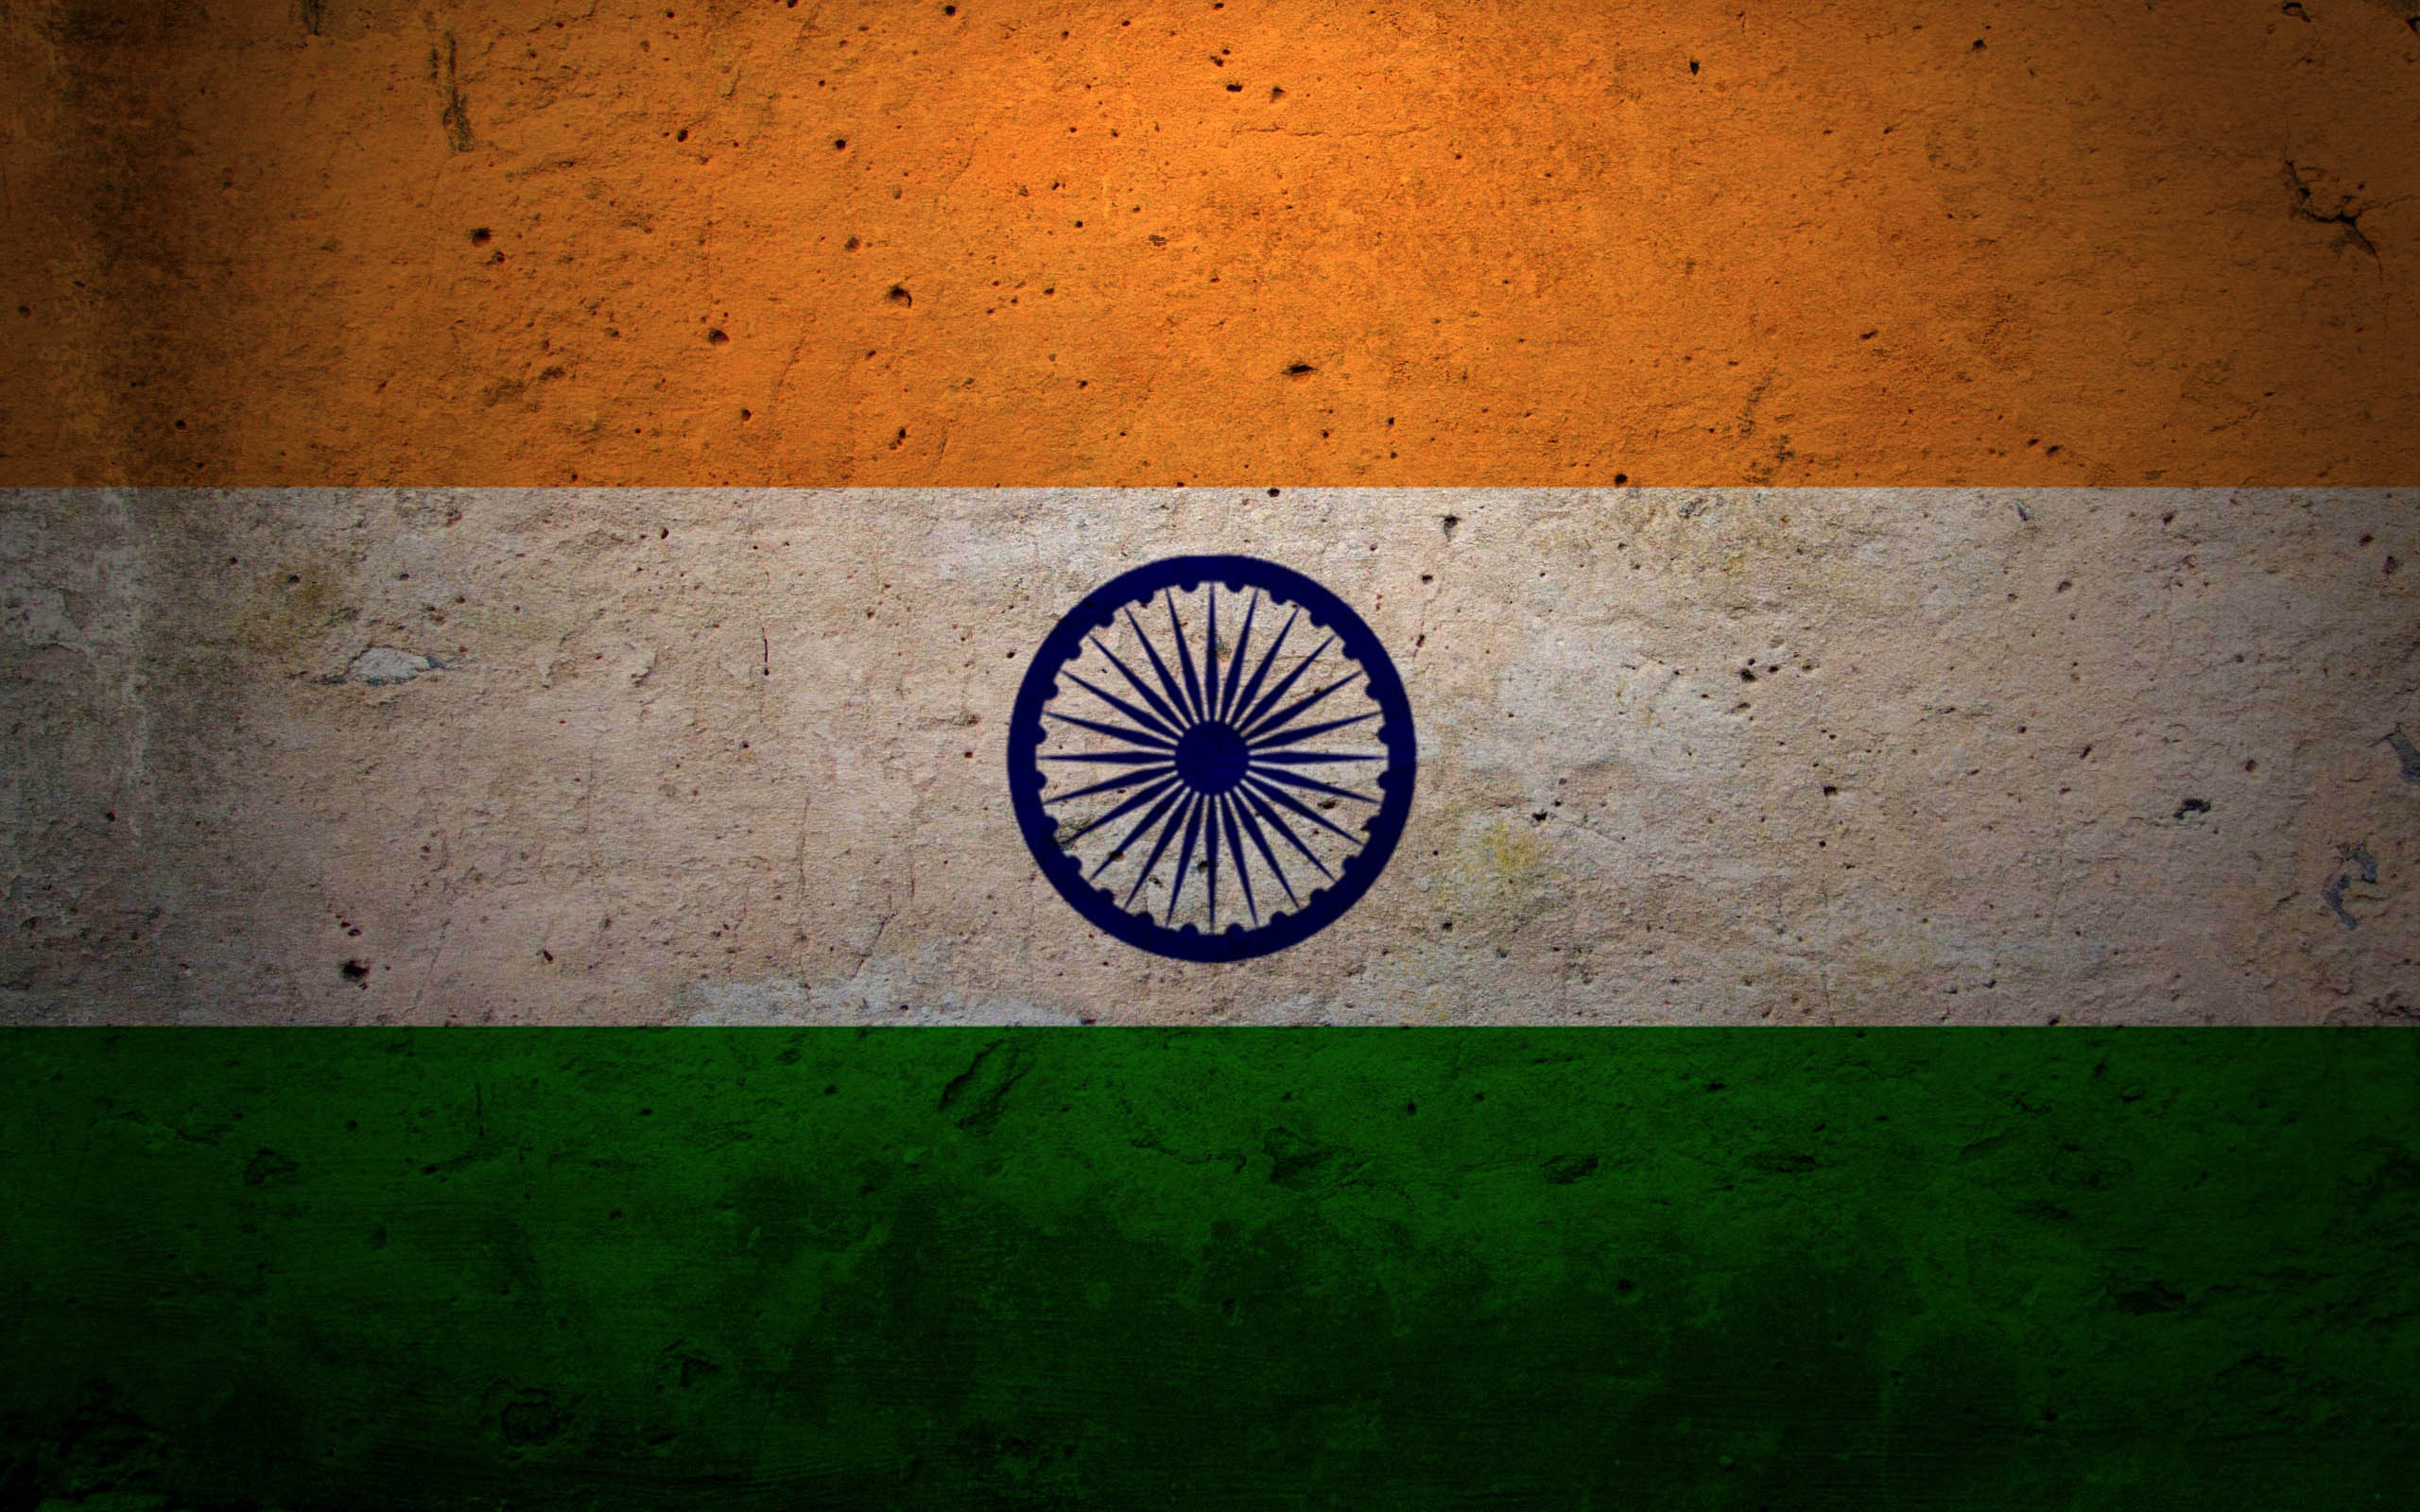 Flag Art India Wallpaper High Quality WallpapersWallpaper Desktop 2560x1600